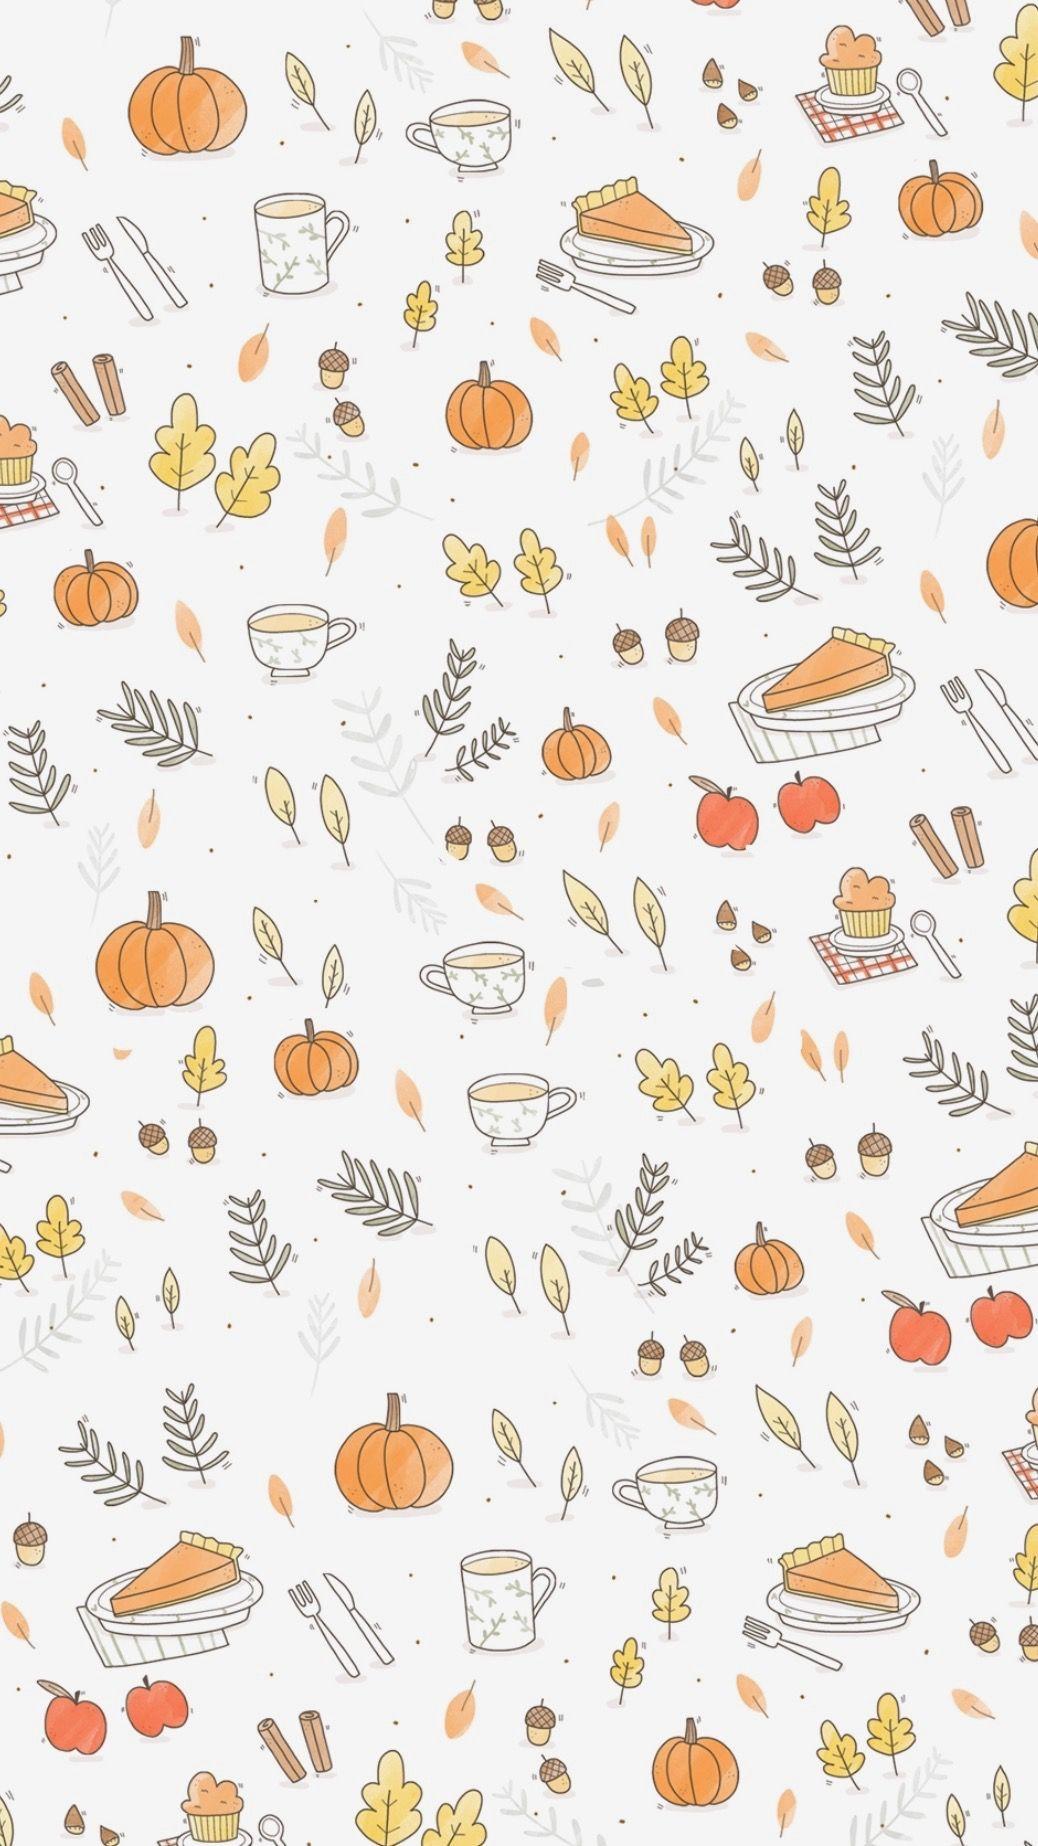 Pin By Jupiter On Autumn Iphone Wallpaper Fall Thanksgiving Wallpaper Cute Fall Wallpaper